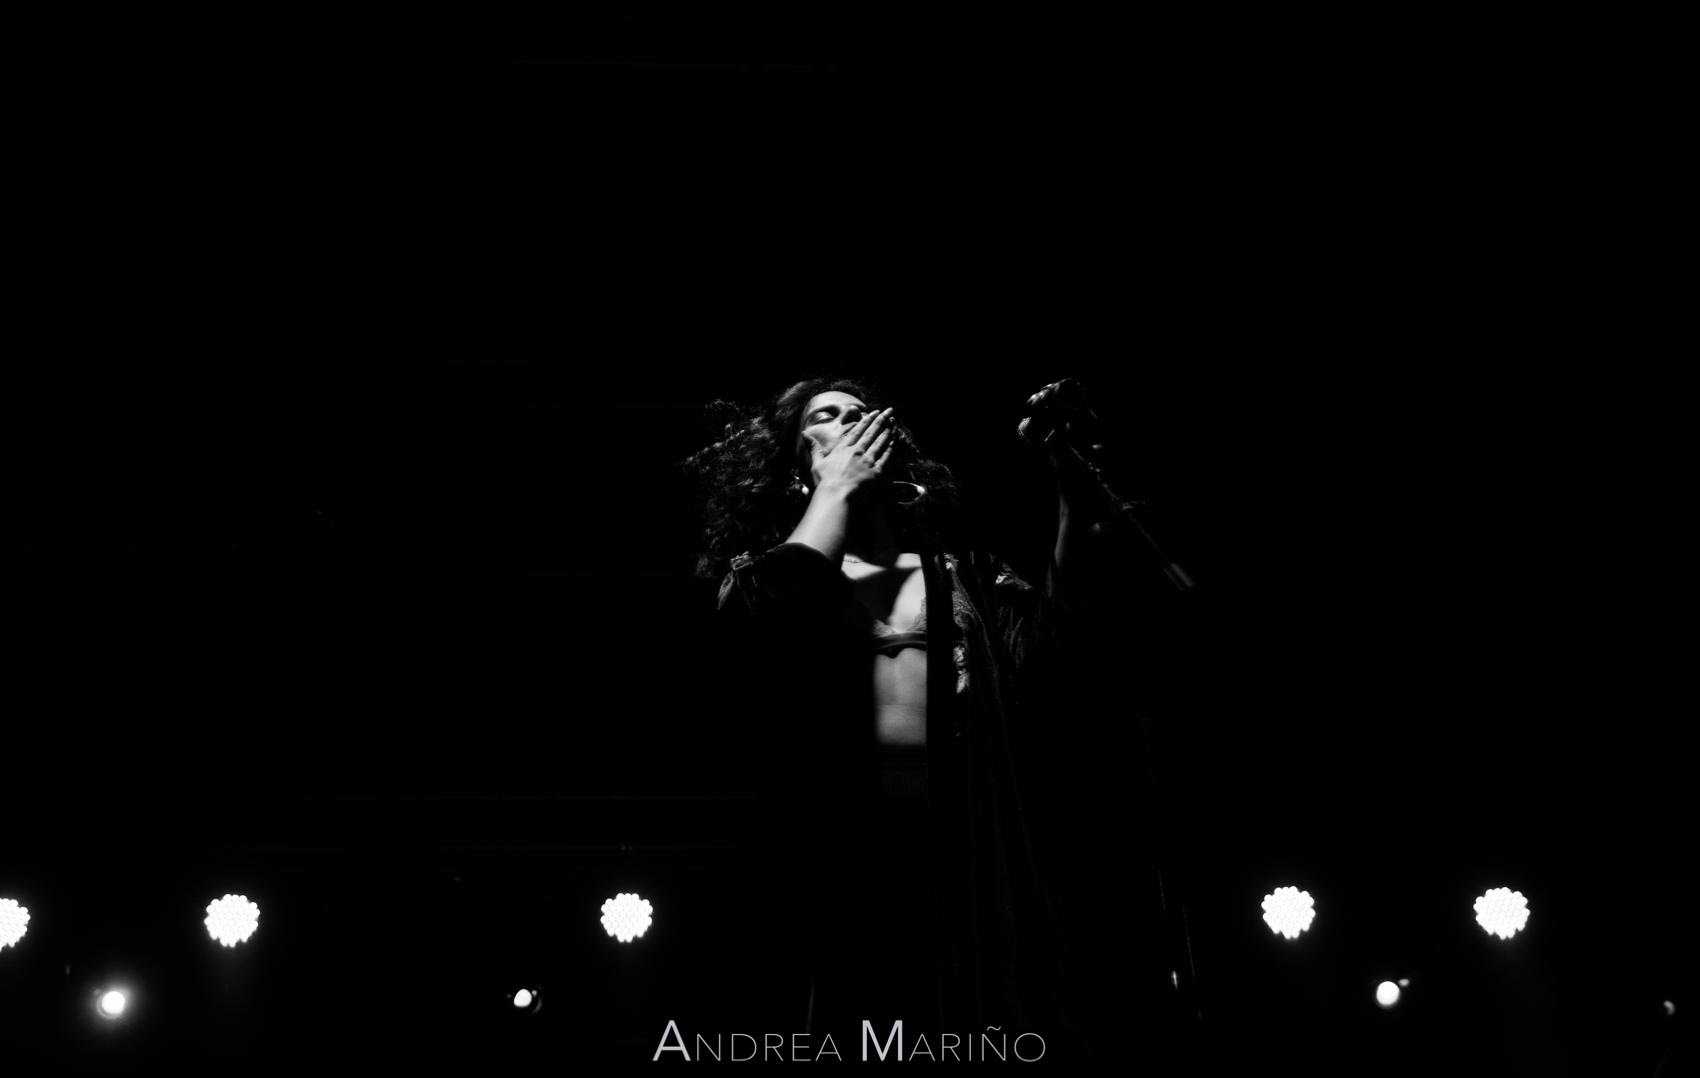 Andrea Mariño. Nathy Peluso. Vive Nigrán. Nigrán. 20/7/18